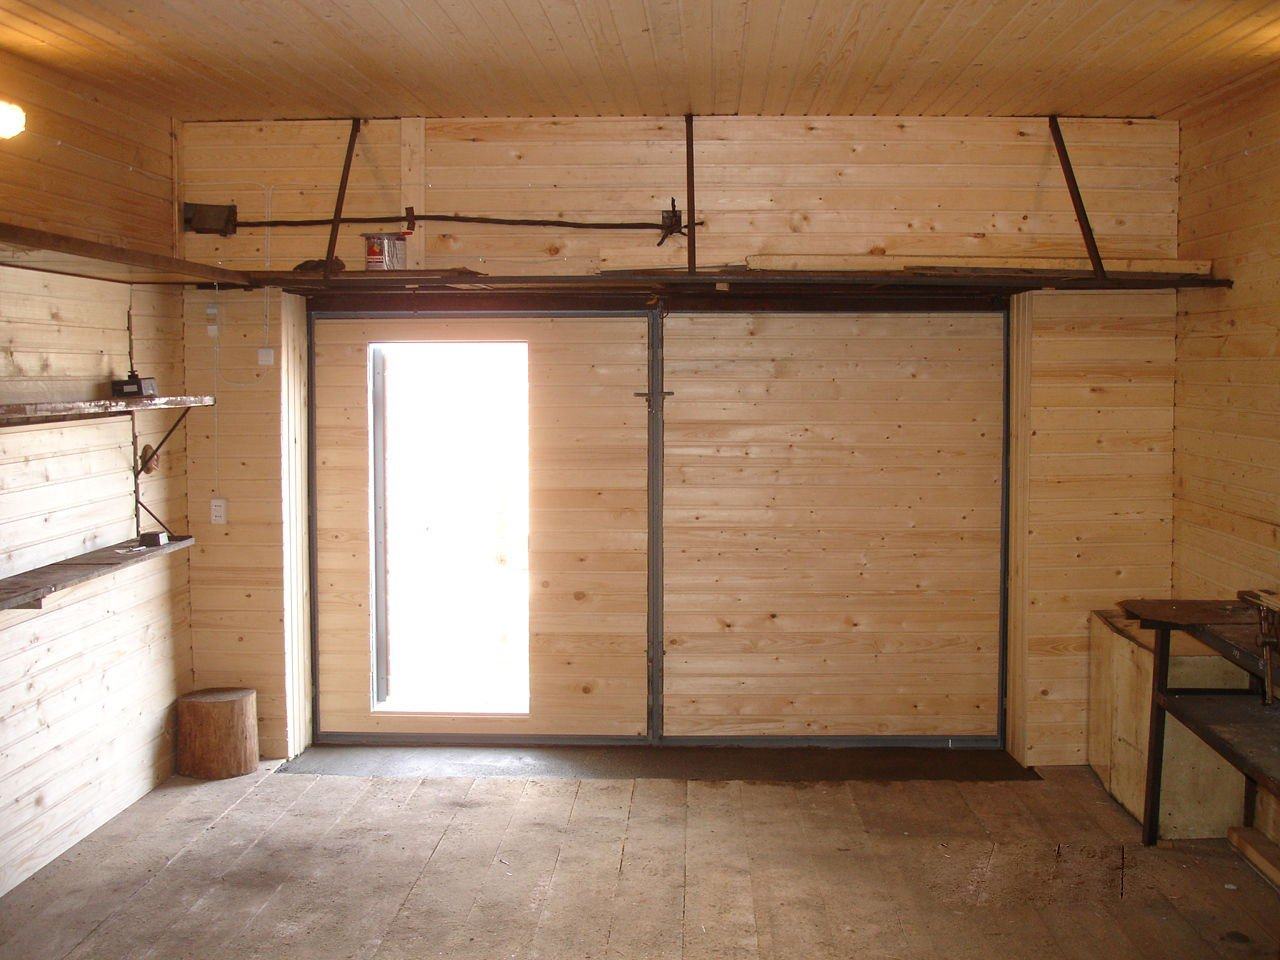 uteplenie-garazha-iznutri-svoimi-rukami-9.jpg